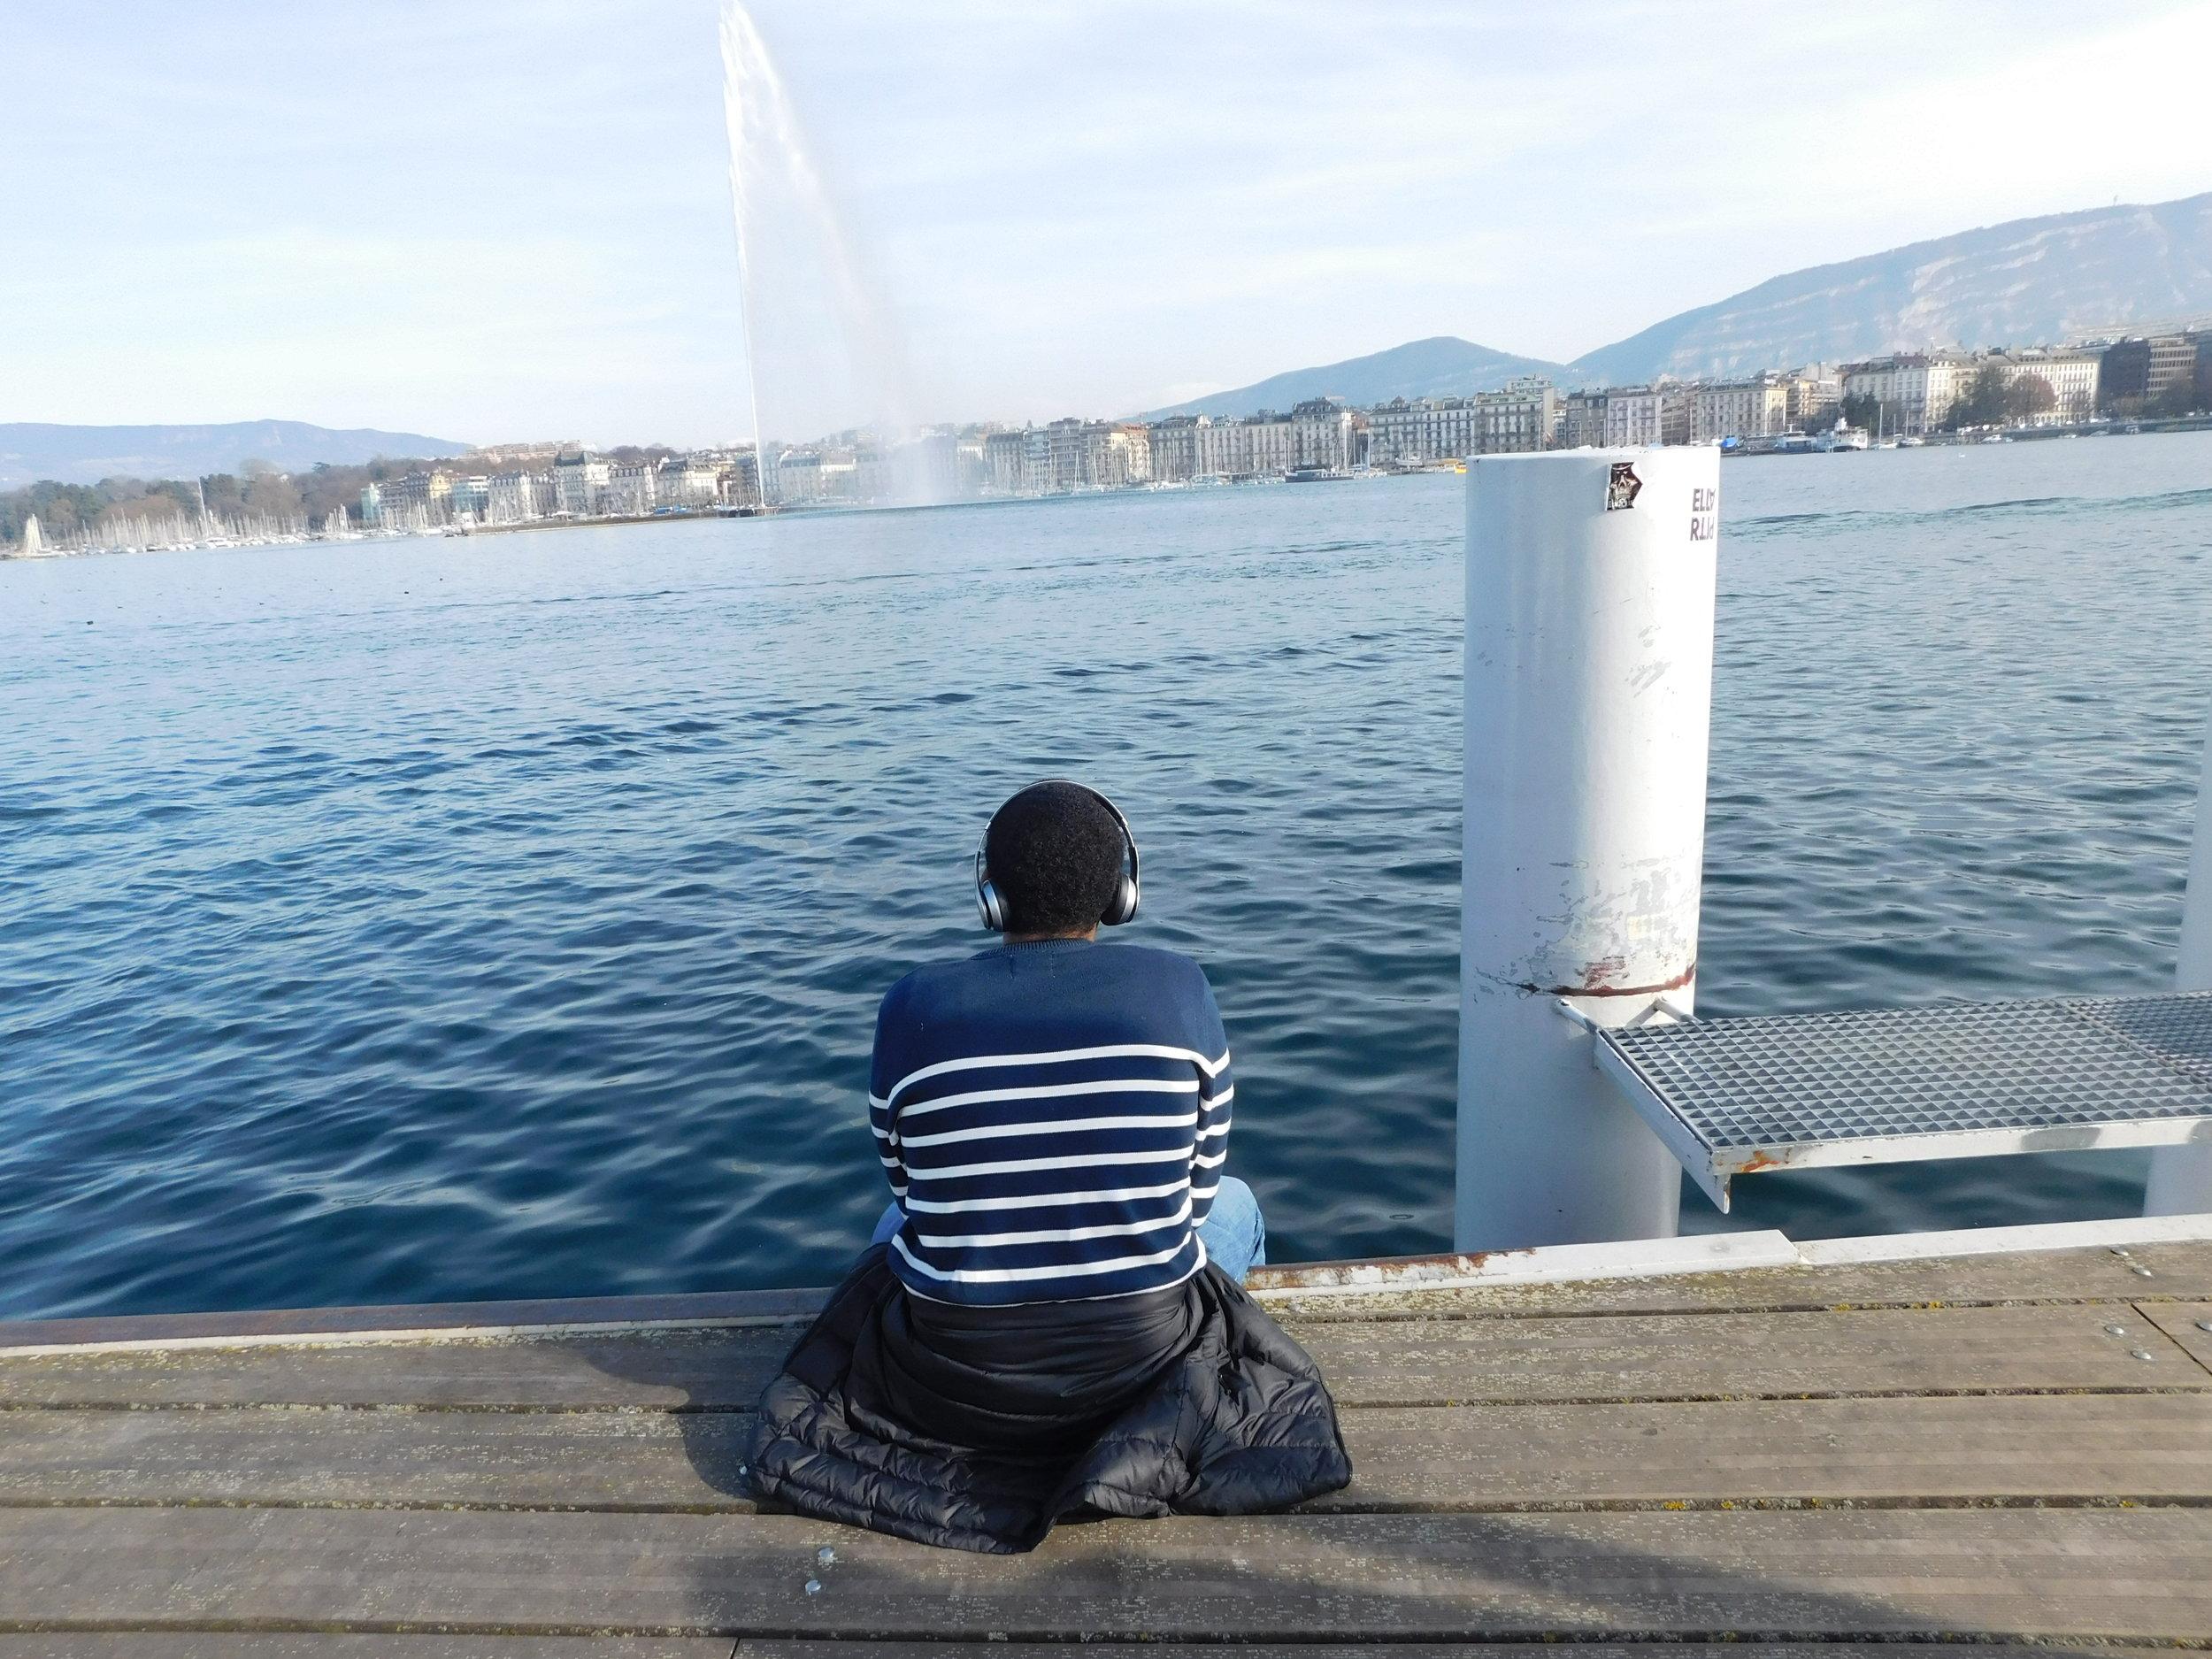 Tyler enjoying a peaceful moment by Lake Geneva